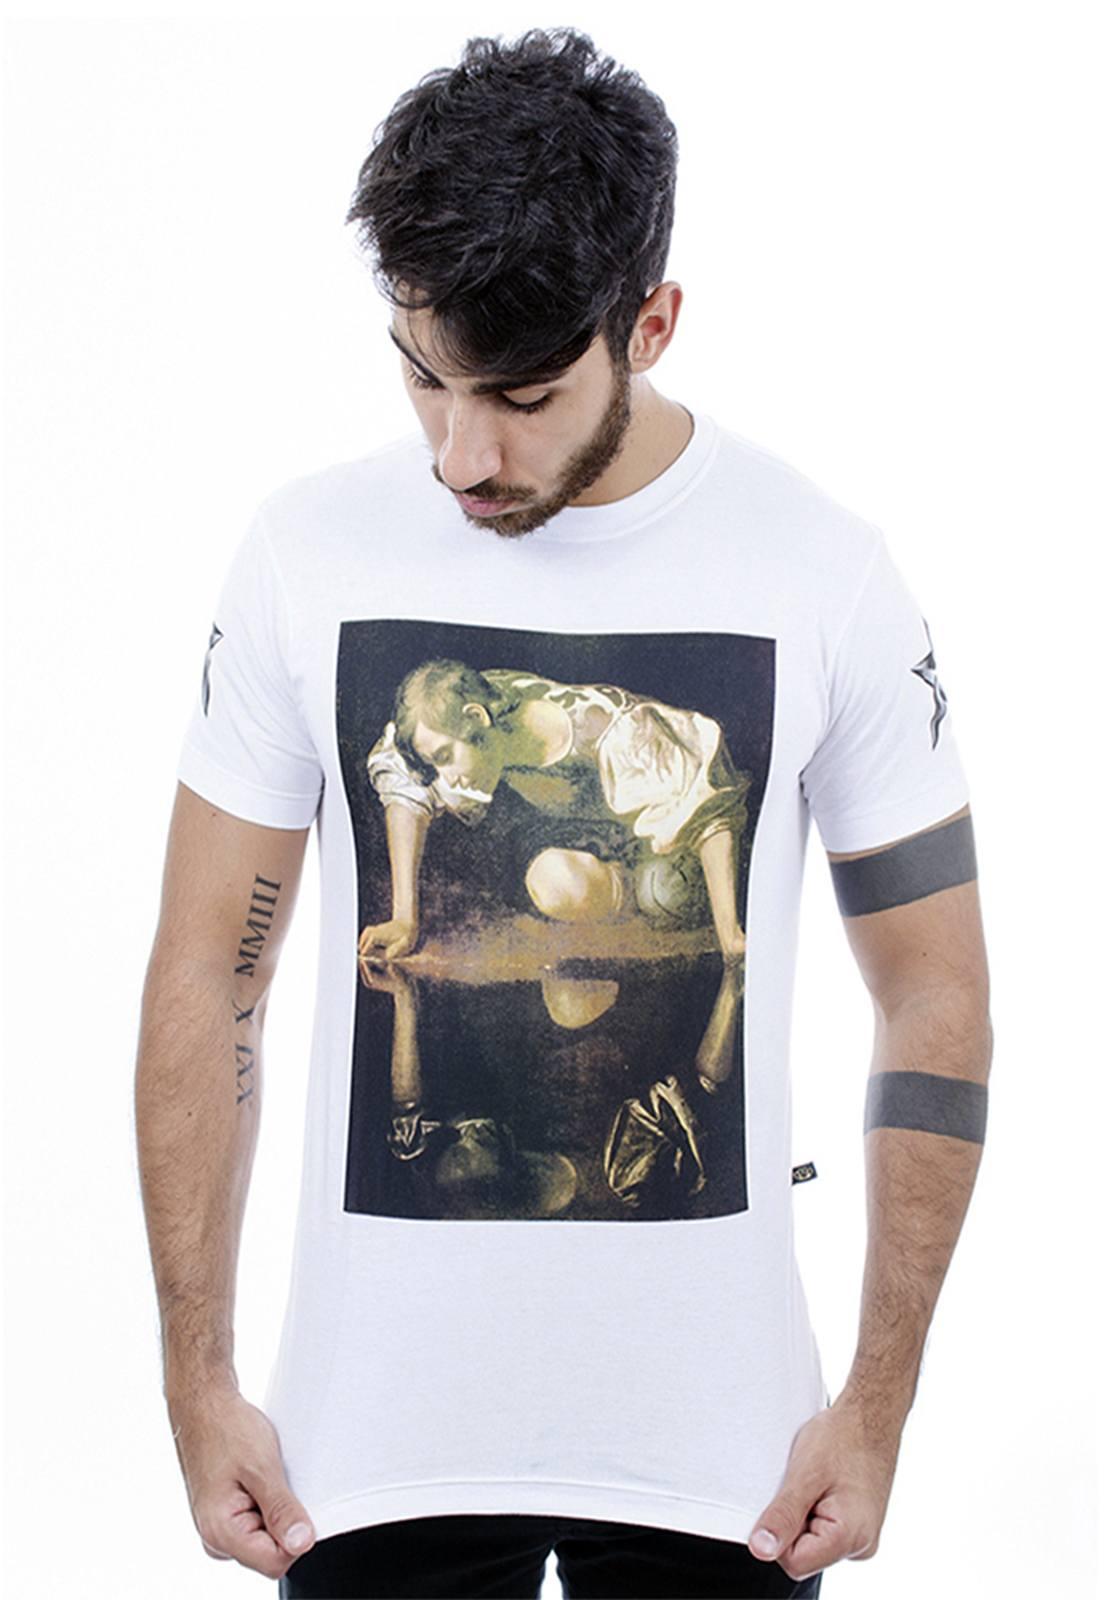 Camiseta masculina branca Reflex - 100% algodão - Hardivision